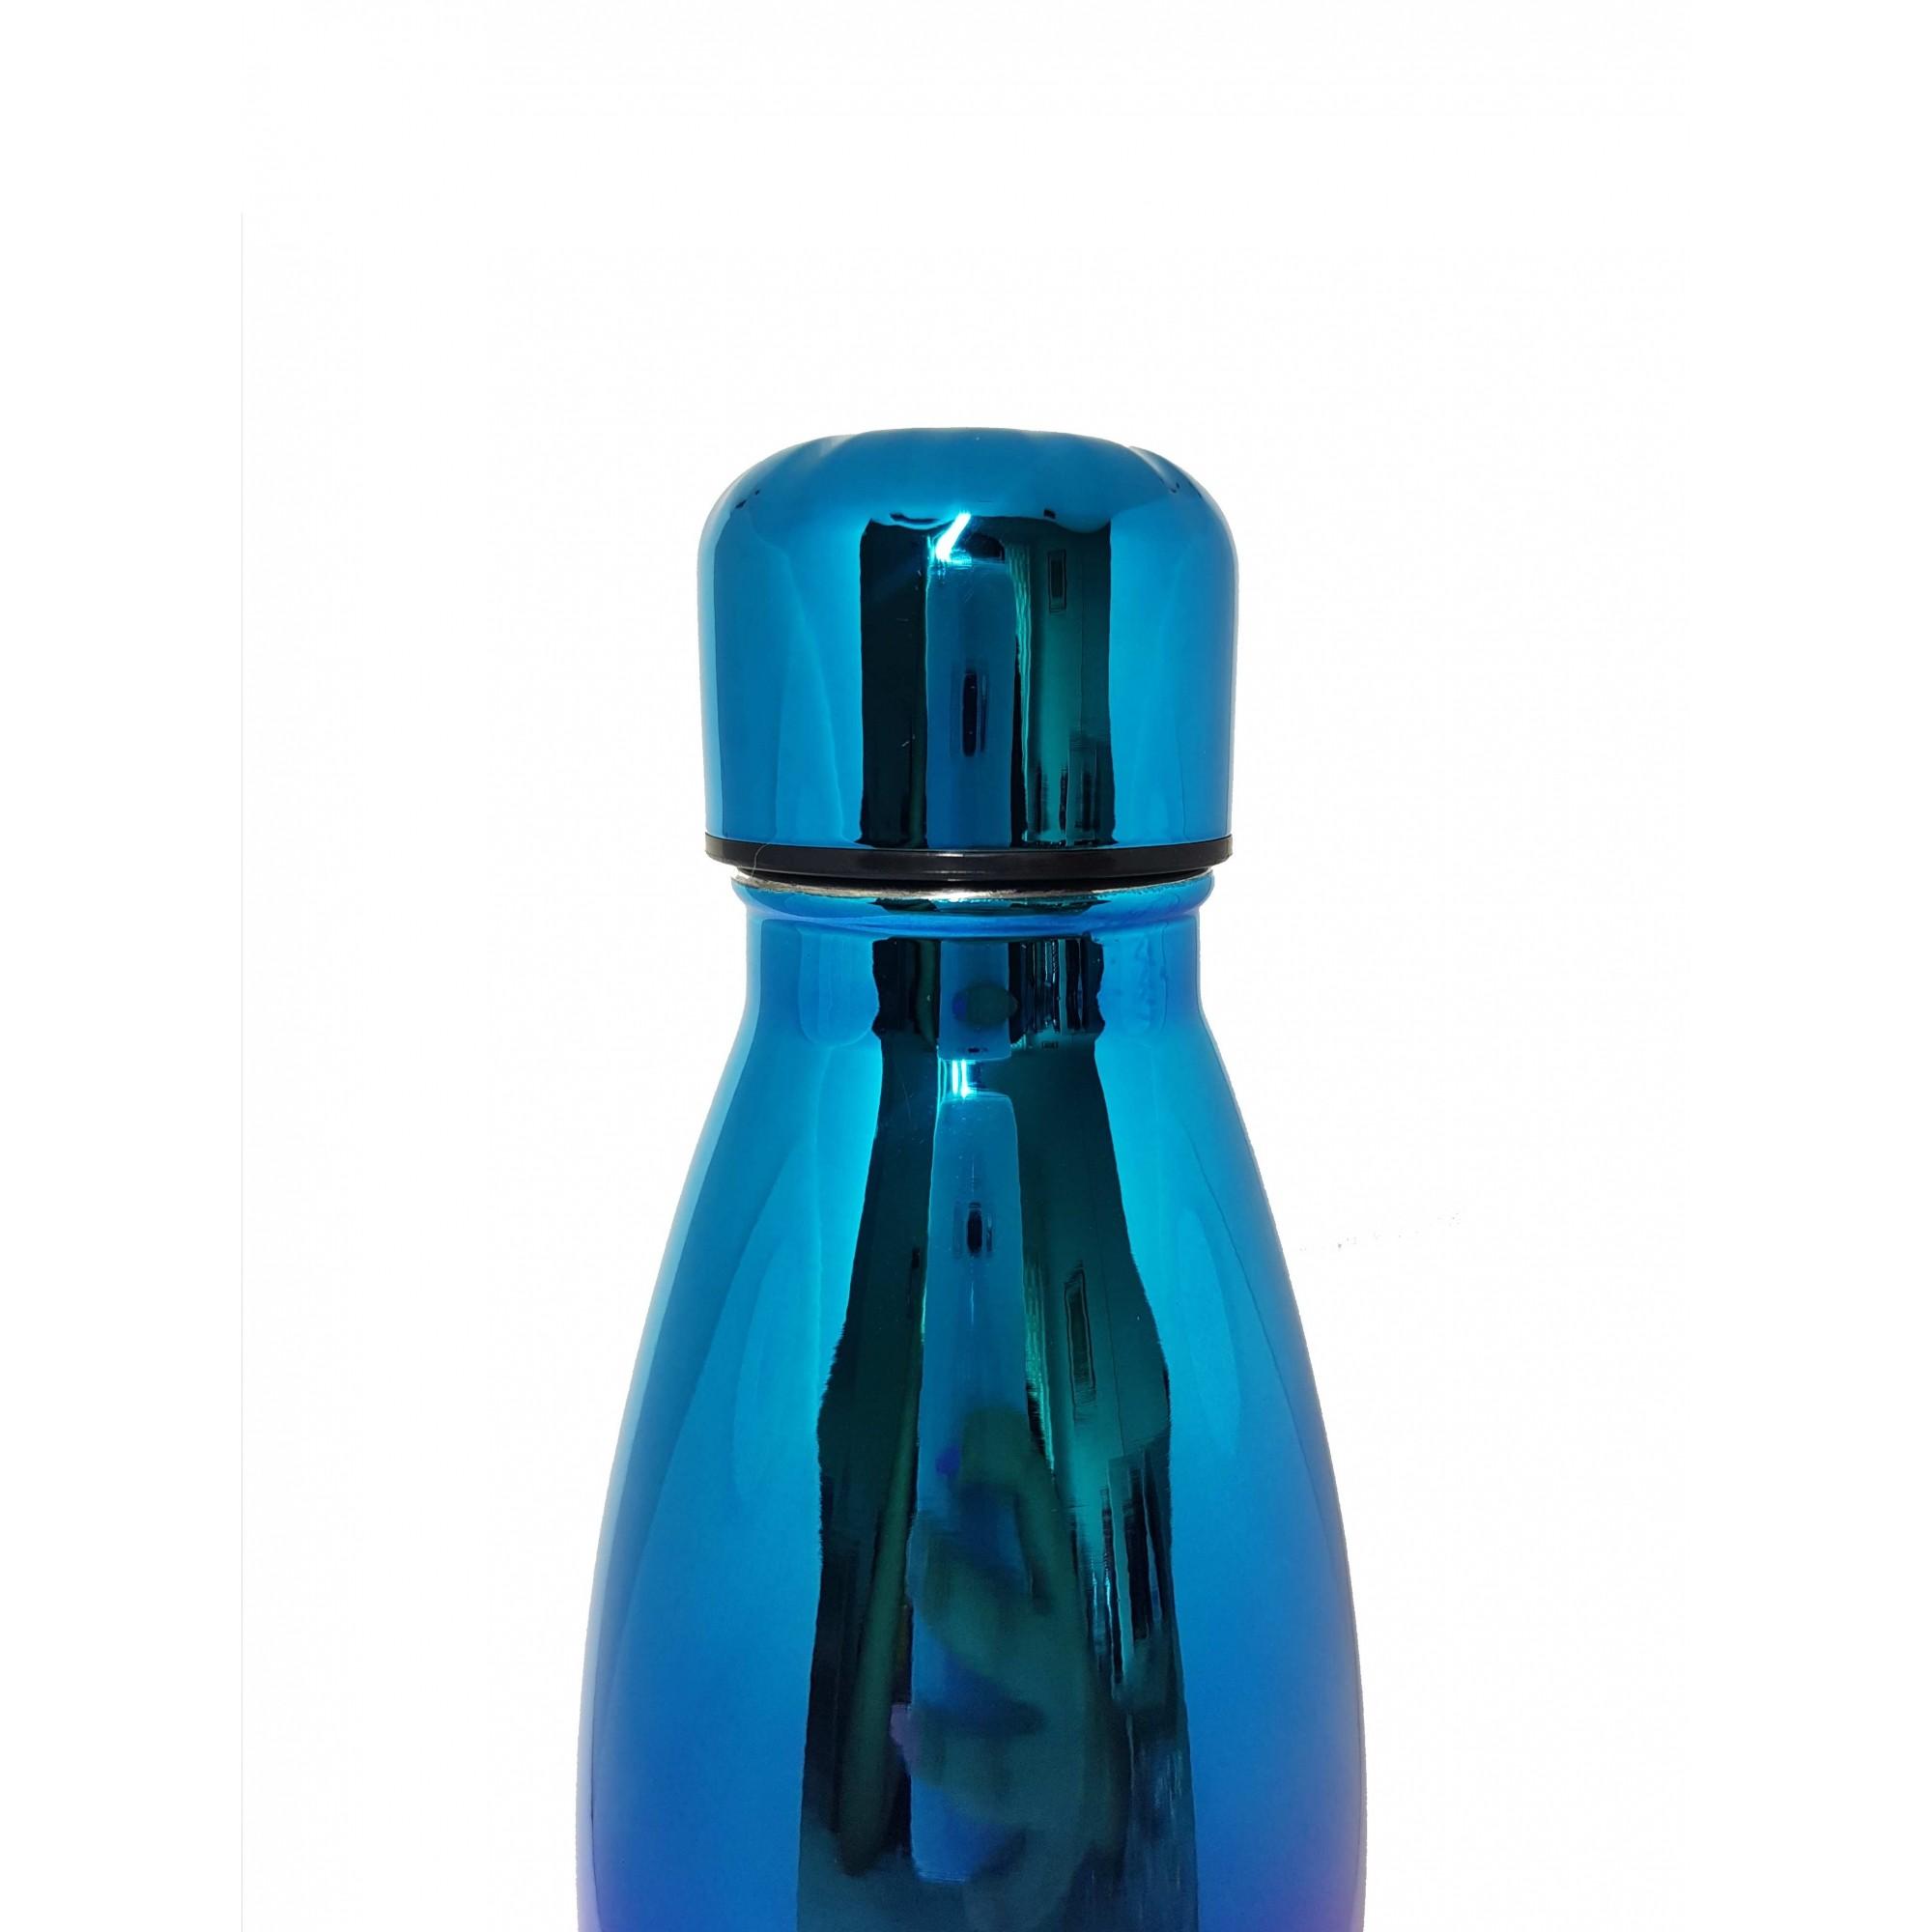 Kit Mundo Bolsa papel + garrafa Holográfica+ kit 5 em 1 inox Rosegold